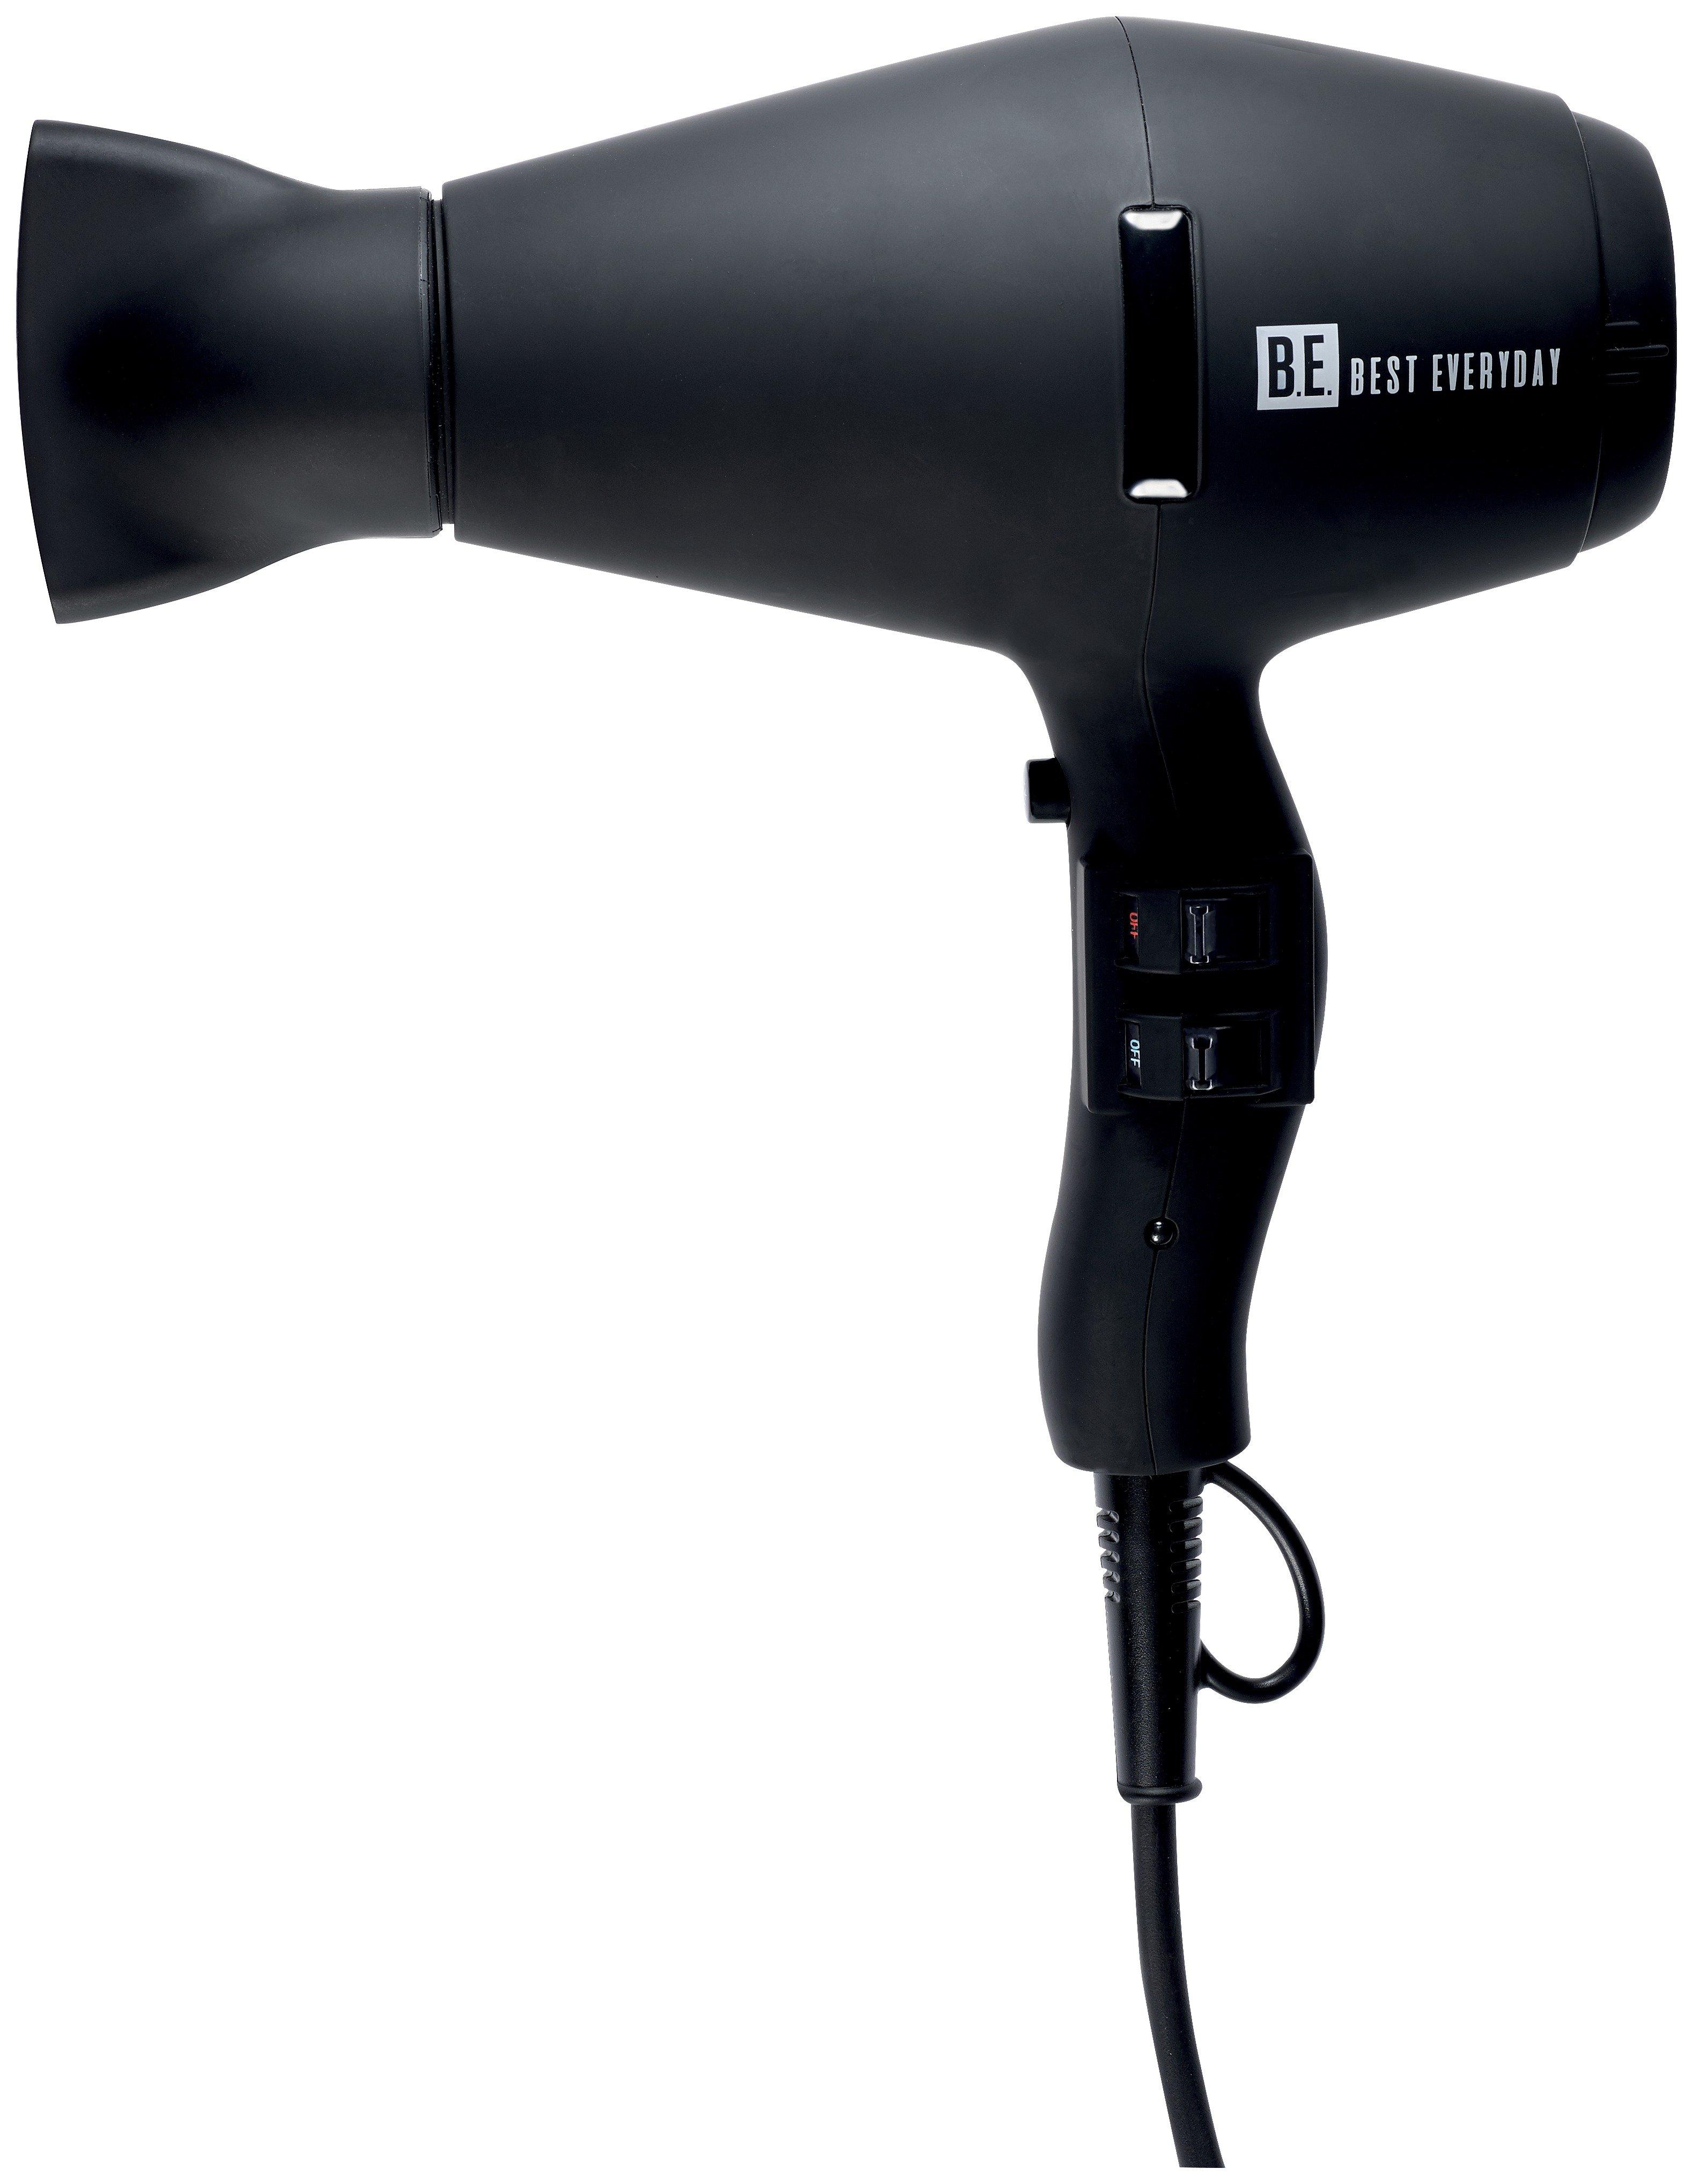 Buy Remington Power Dry Hair Dryer D3010 At Argos Co Uk